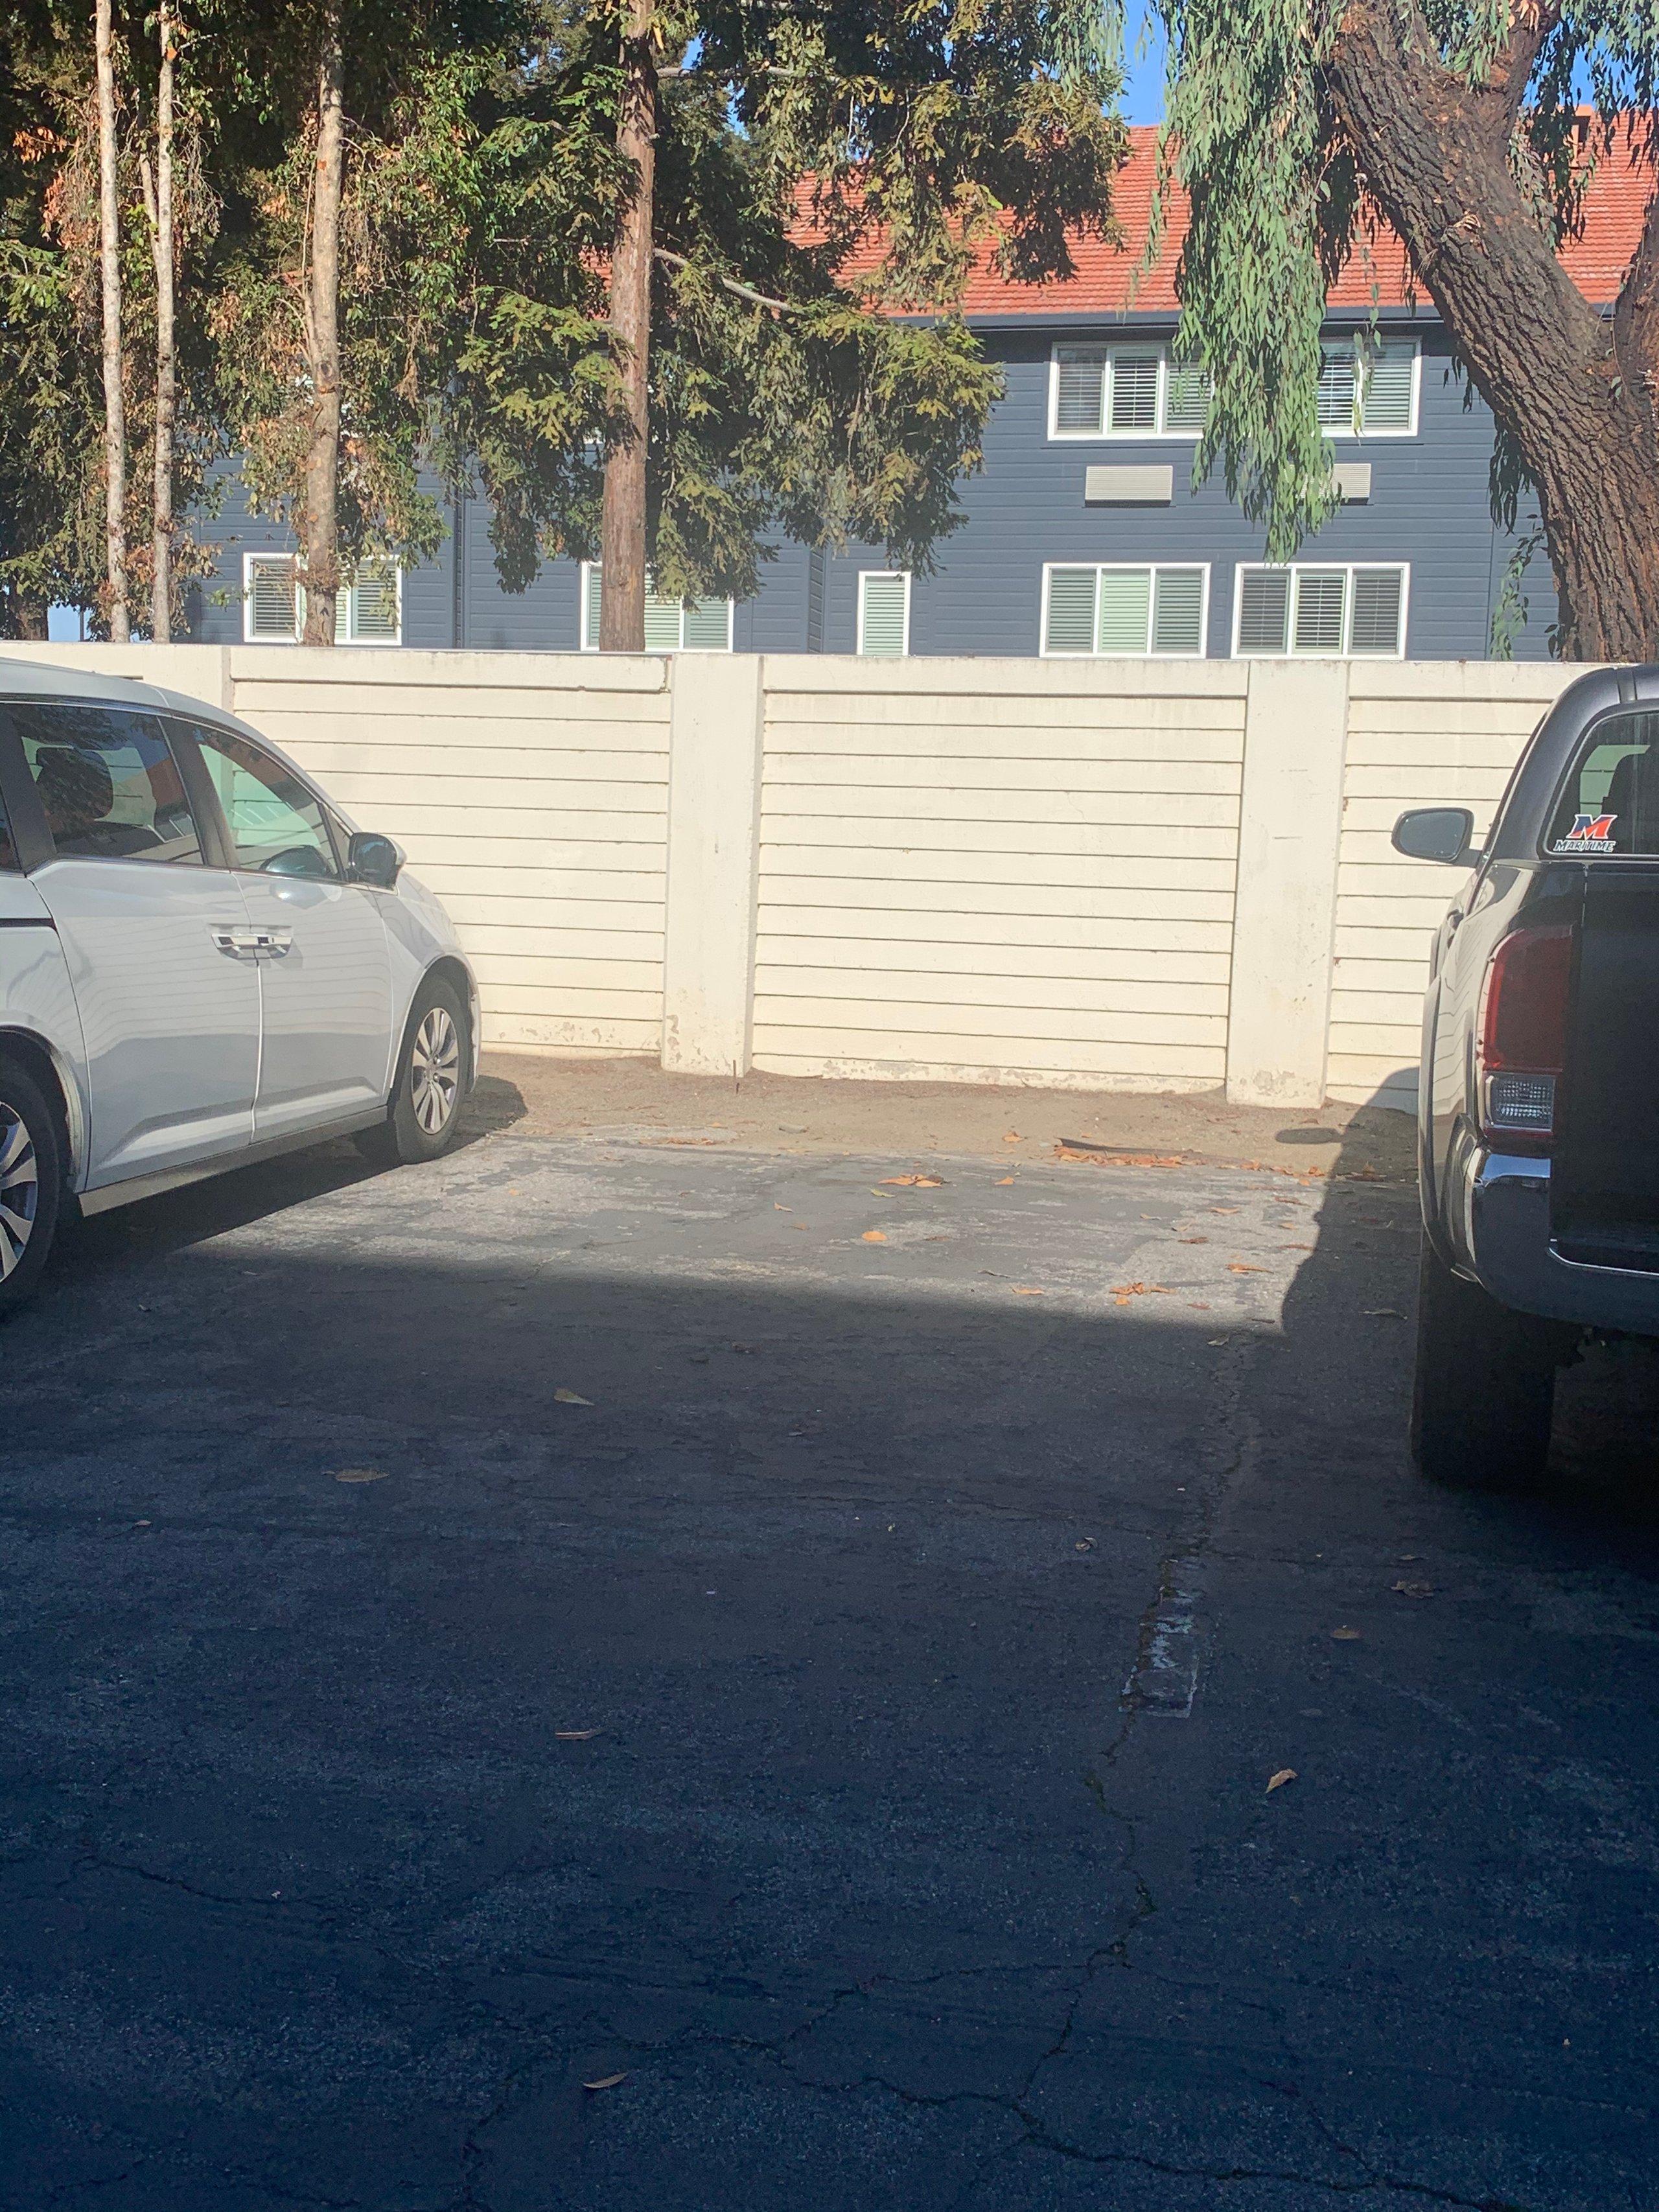 10x10 Parking Lot self storage unit